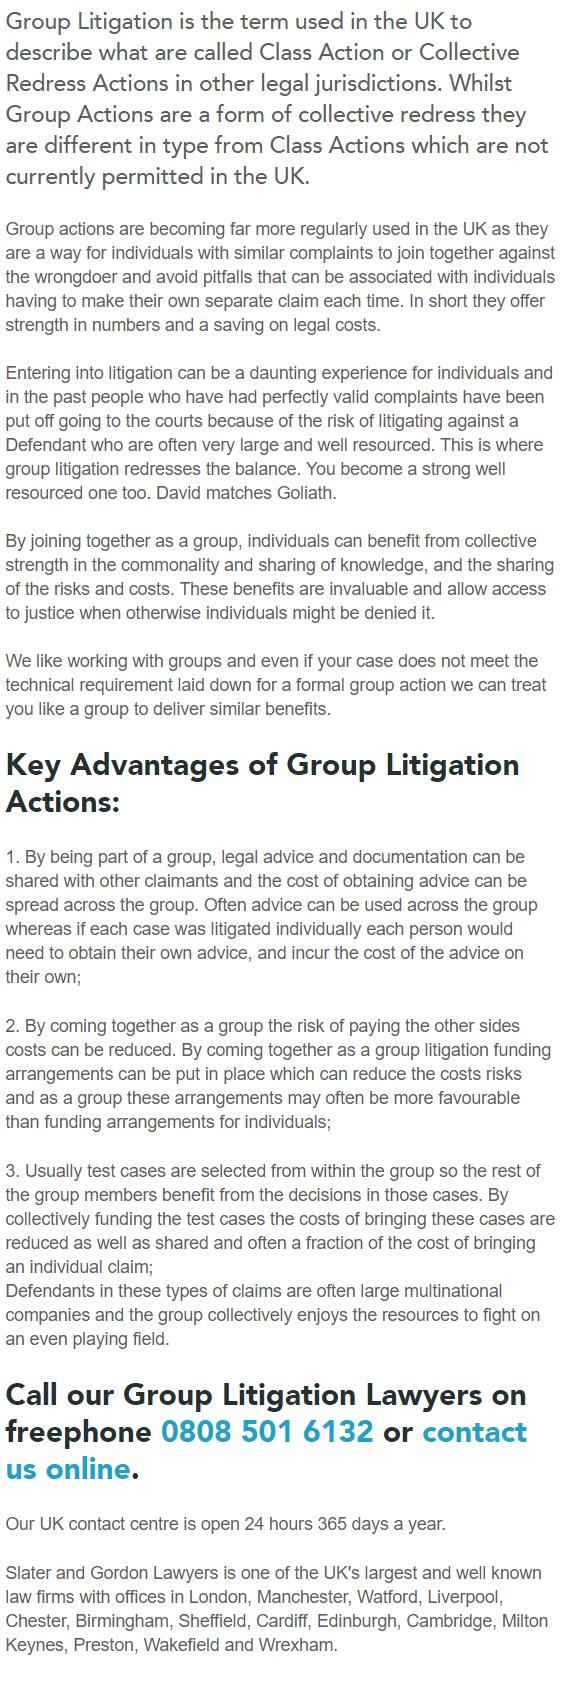 Group Litigation Explained- Slater & Gordon - Paul Ponting Ormskirk